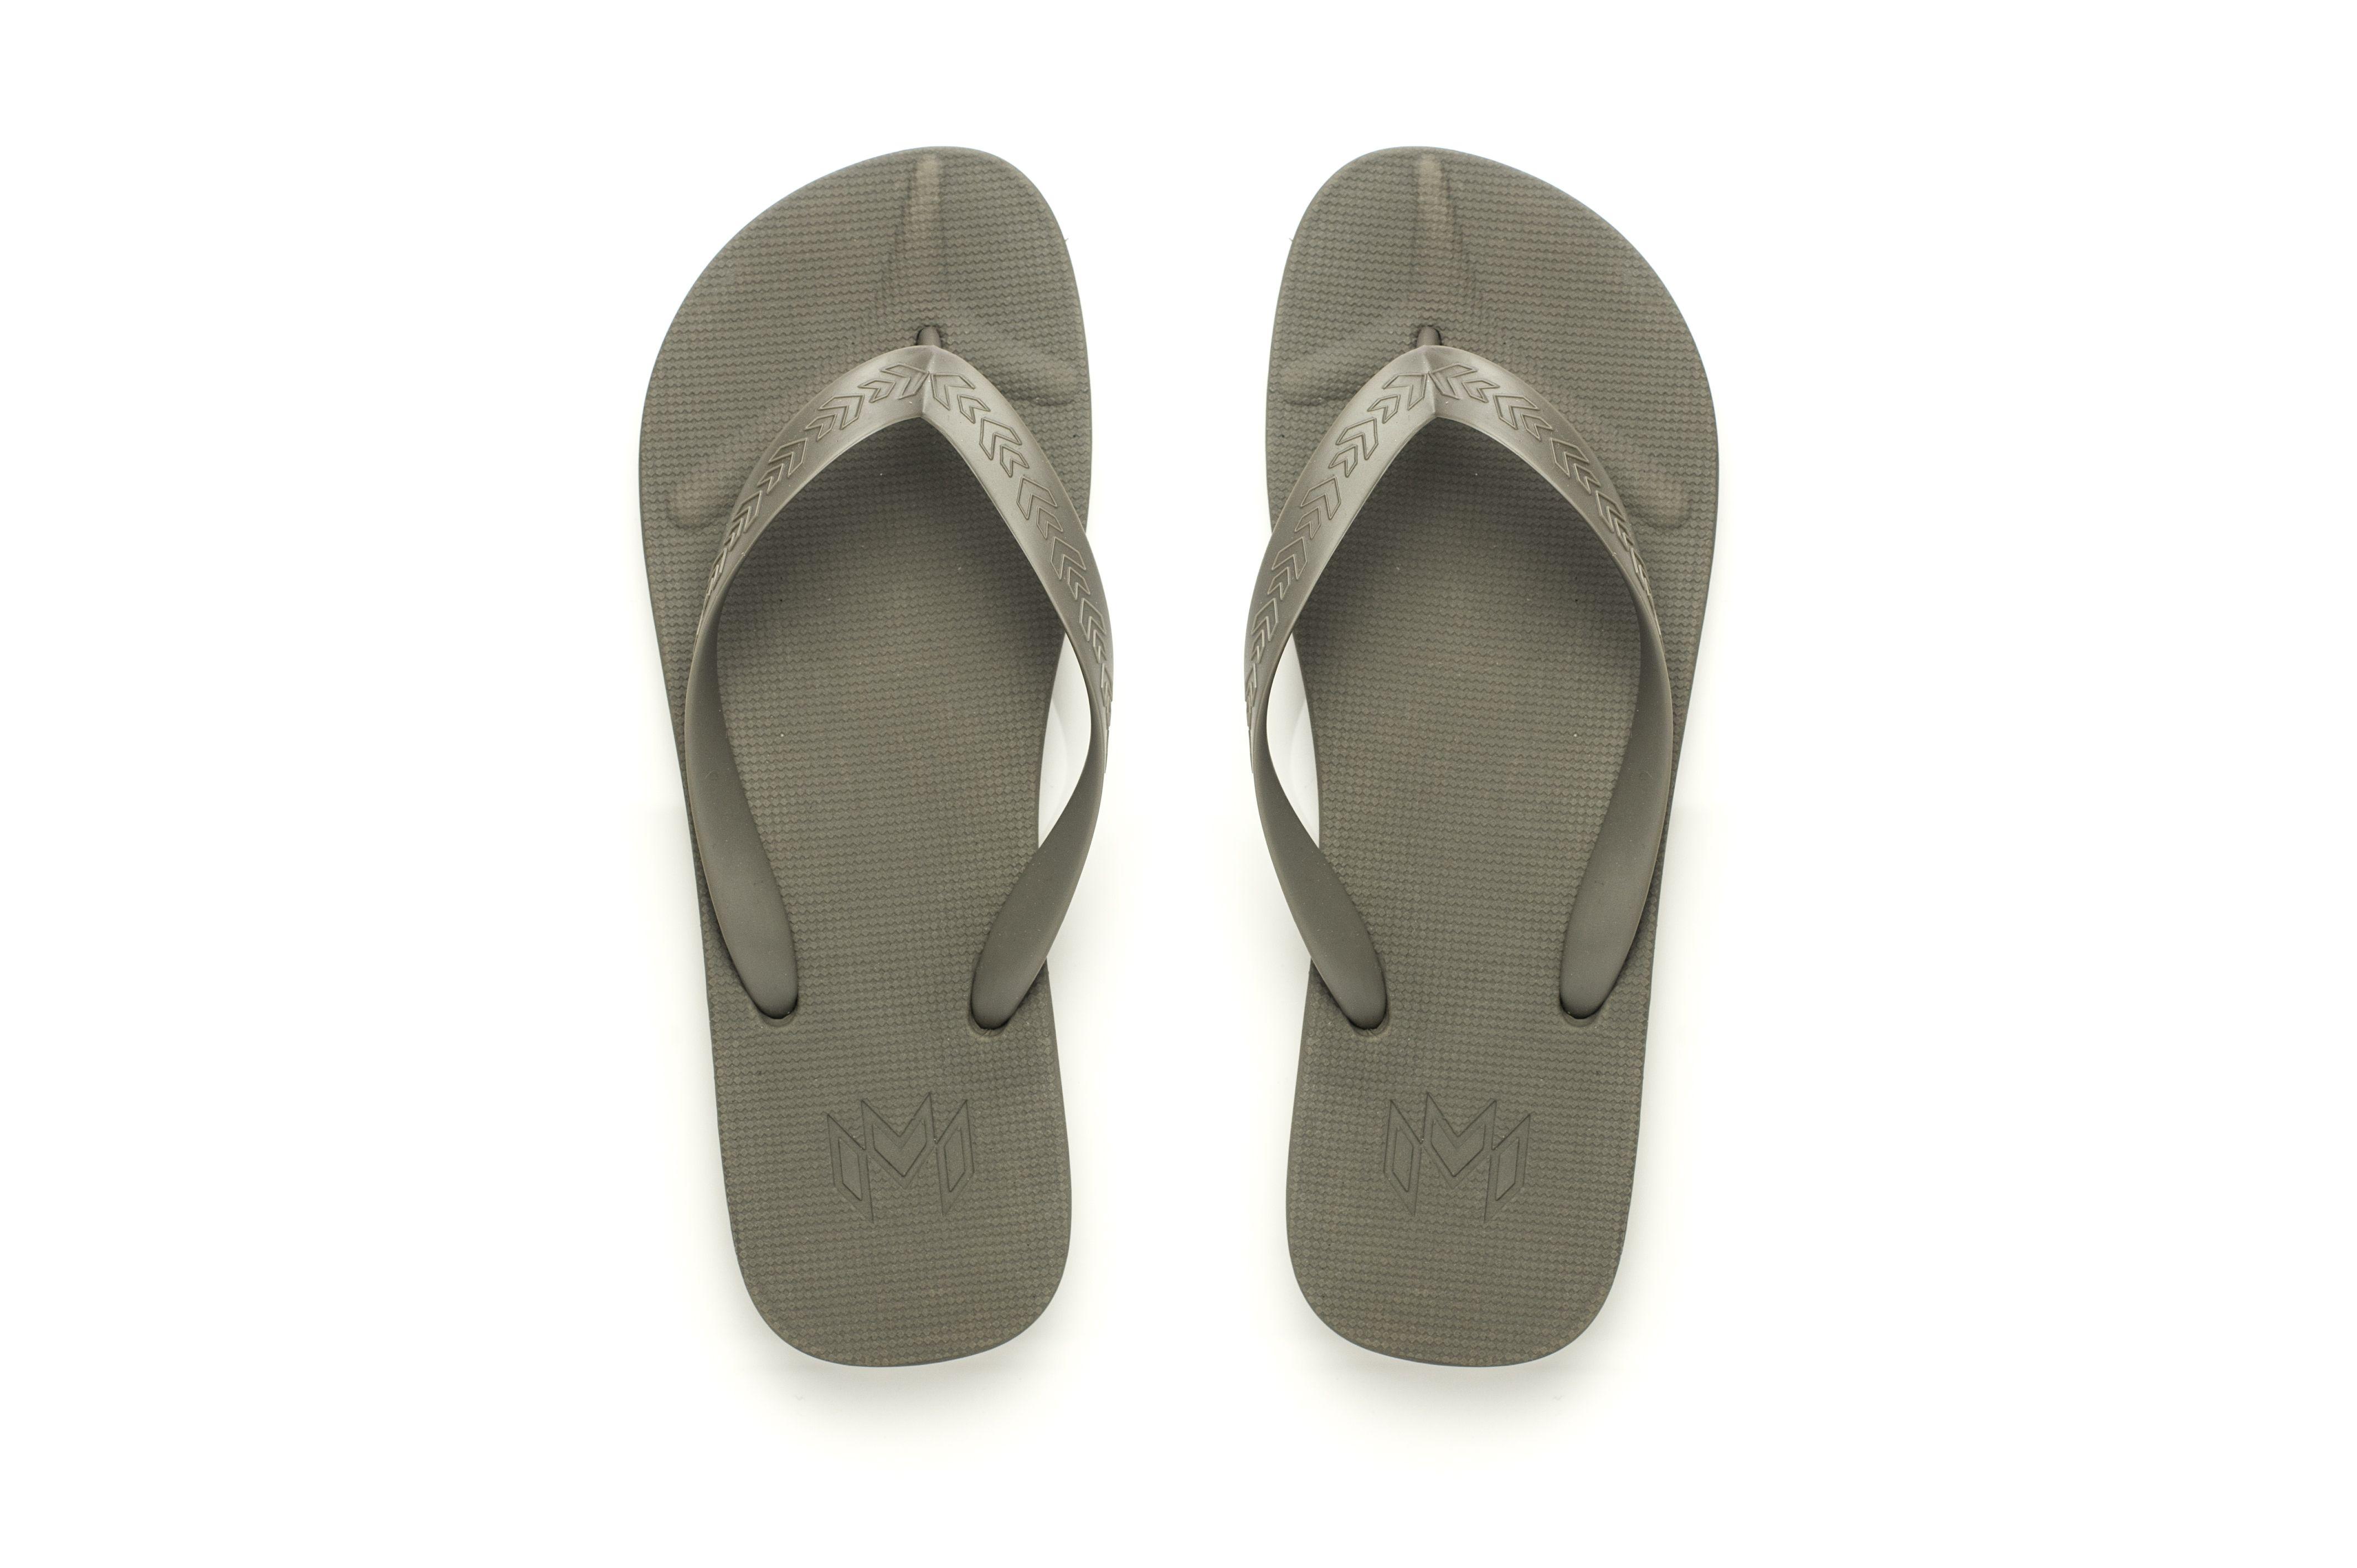 bdb6094d8 MALVADOS Men s Playa flip flop in Marine. One piece moulded EVA with toe  pillow design